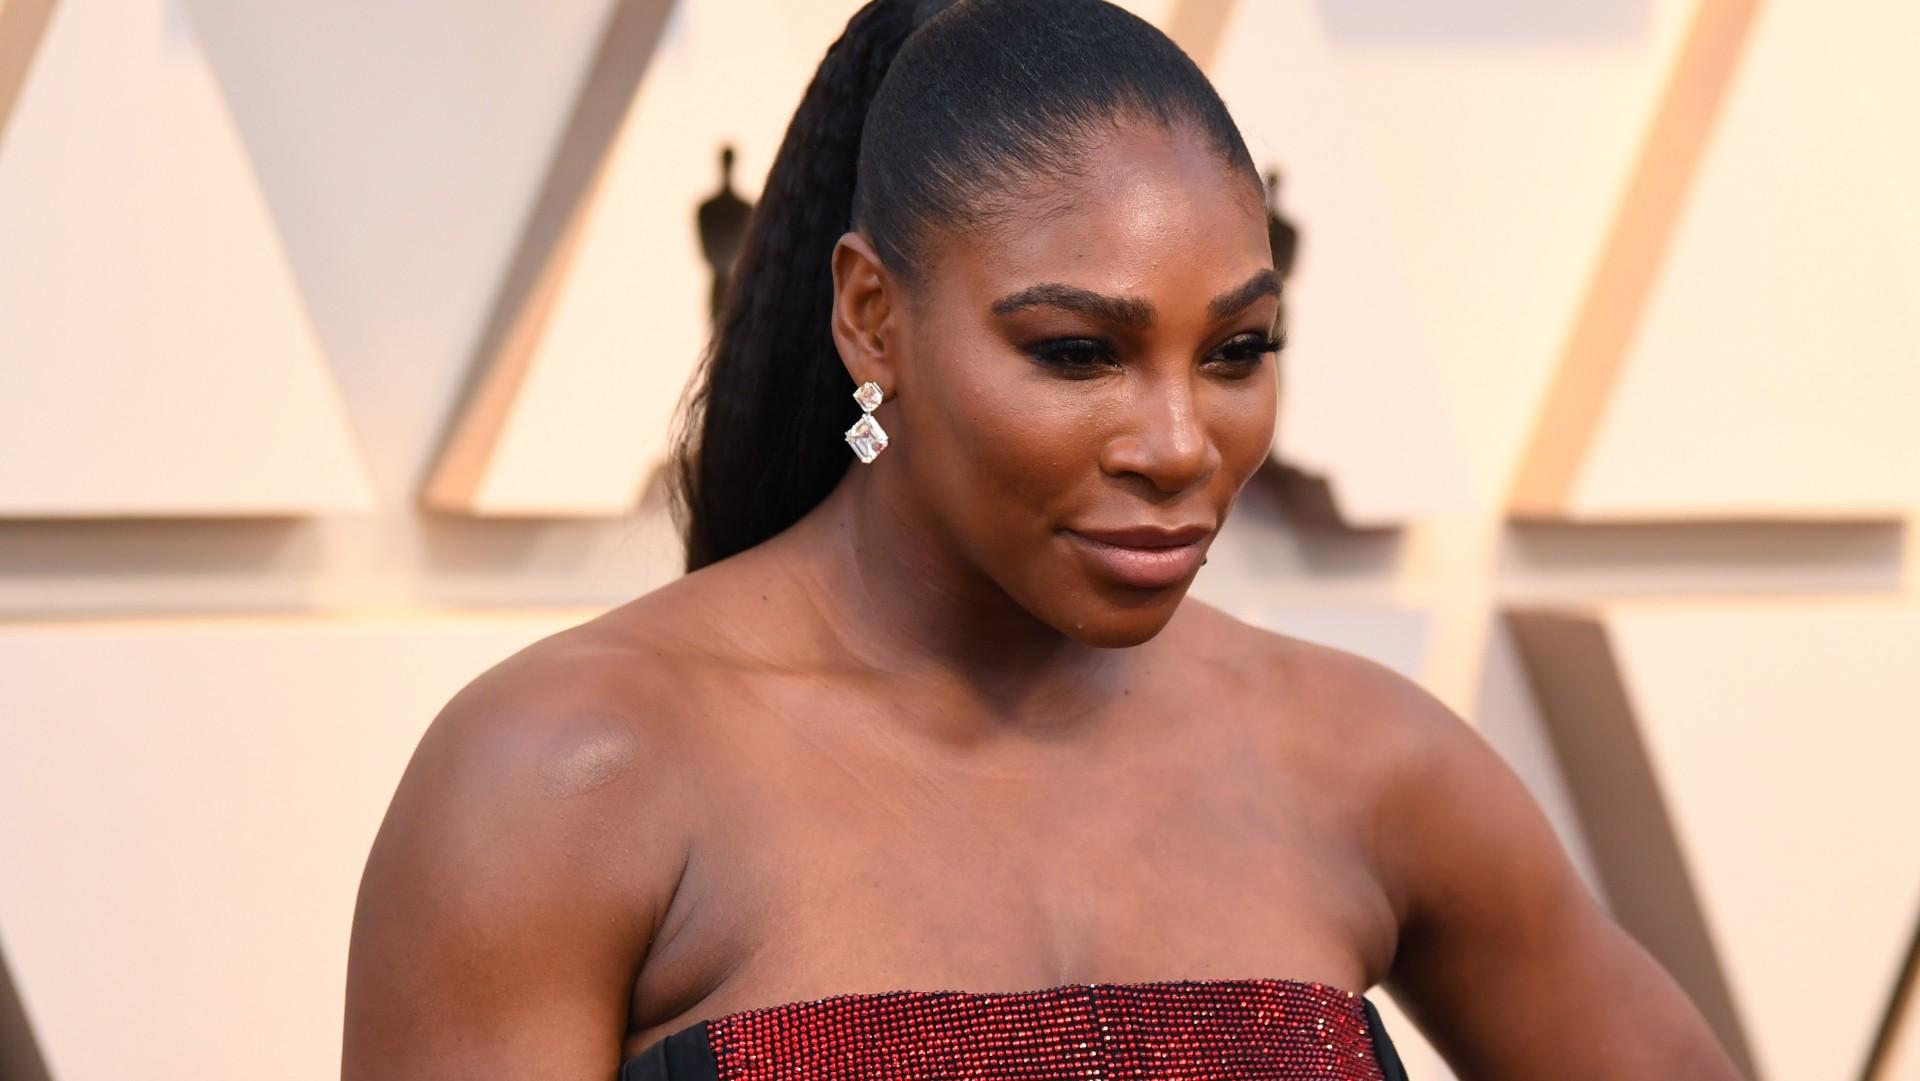 Transgender serena williams Serena is